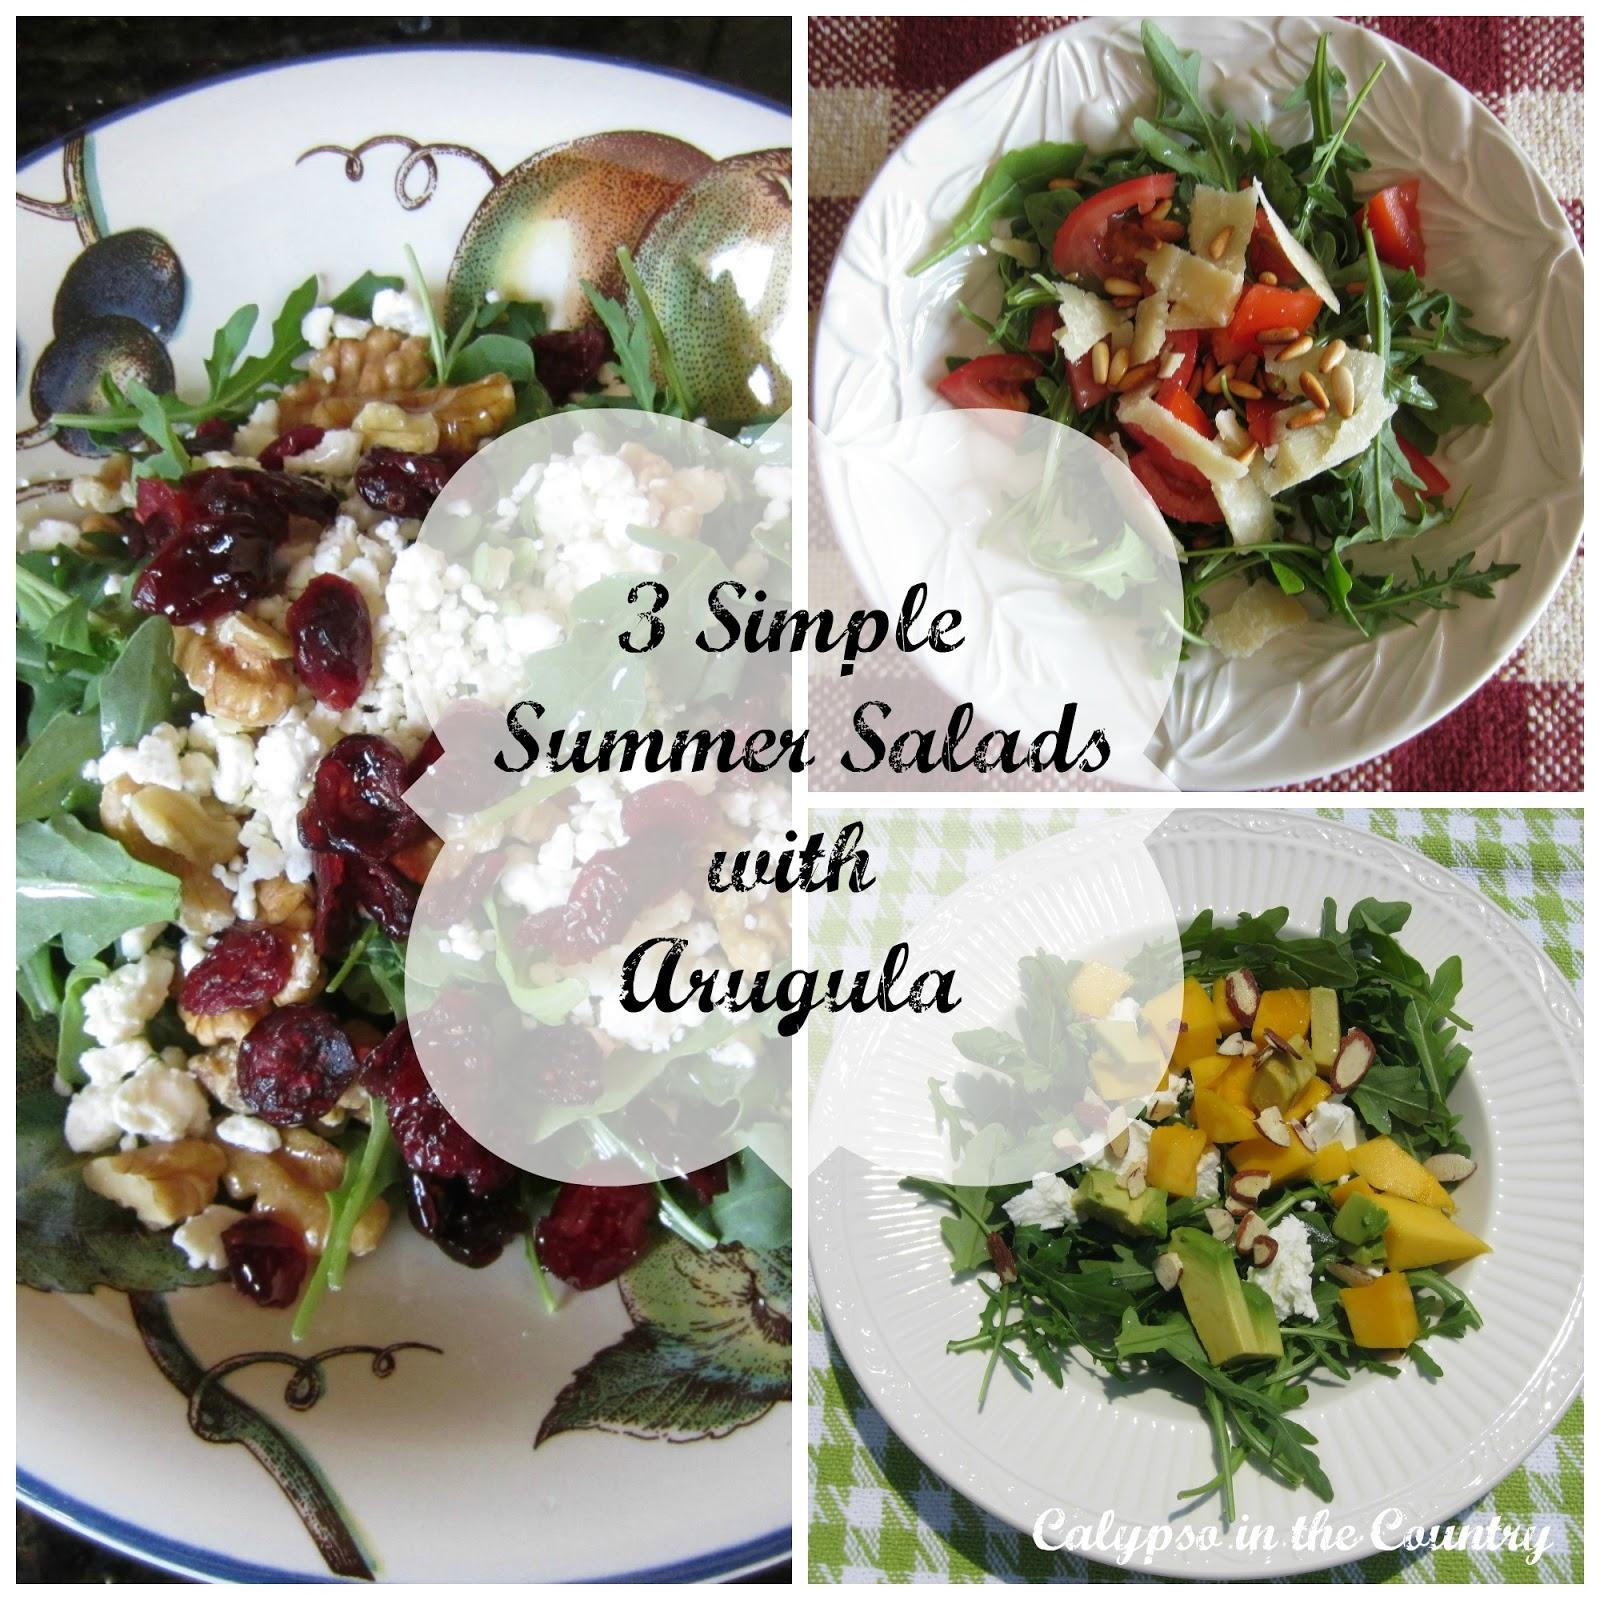 Simple Summer Salads - 3 Ways to do arugula